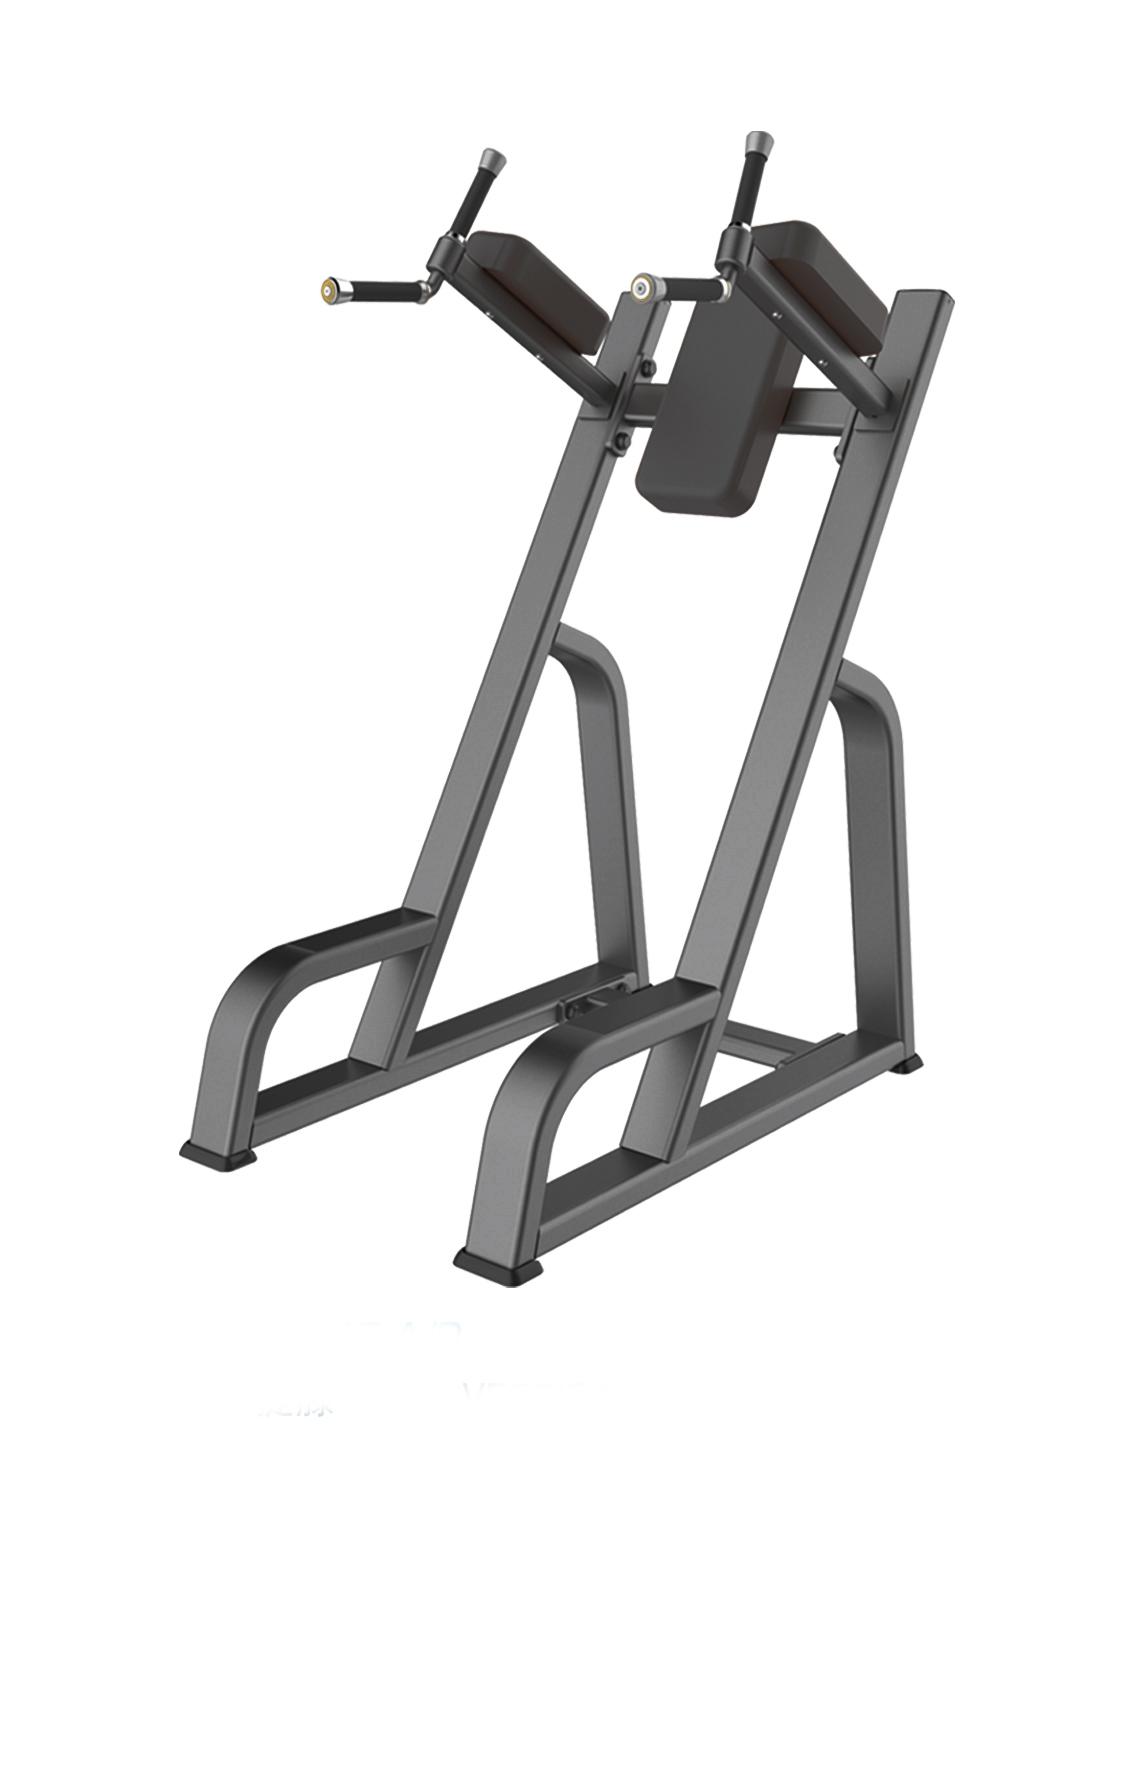 Тренажер GROME Fitness AXD5047A Брусья-пресс тренажер body solid fcd стойка пресс турник брусья